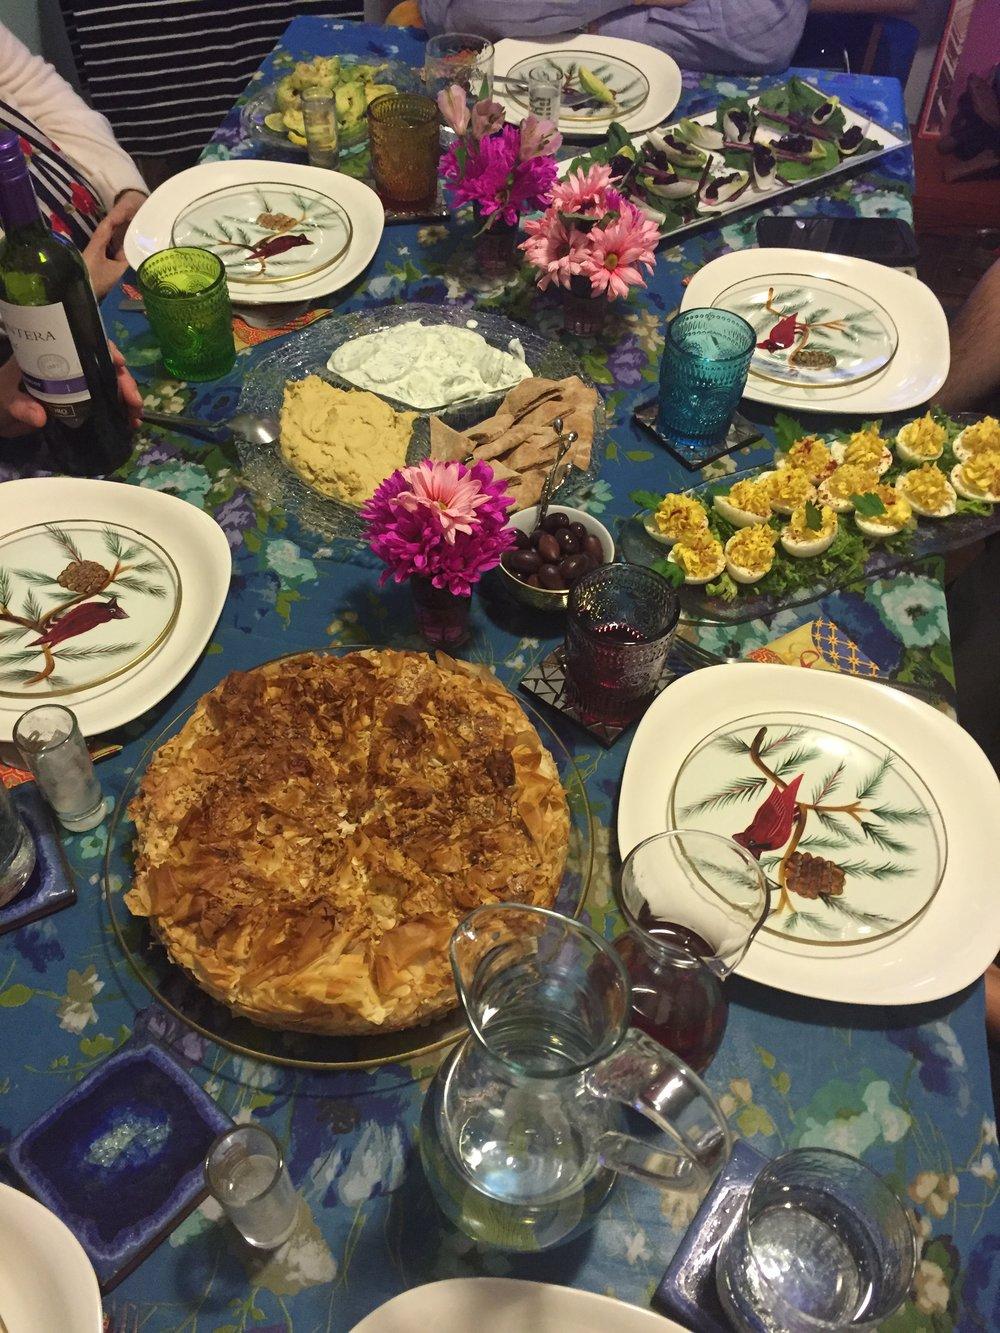 Figure 2b.  The daughter's [Armenian] Christmas dinner table.